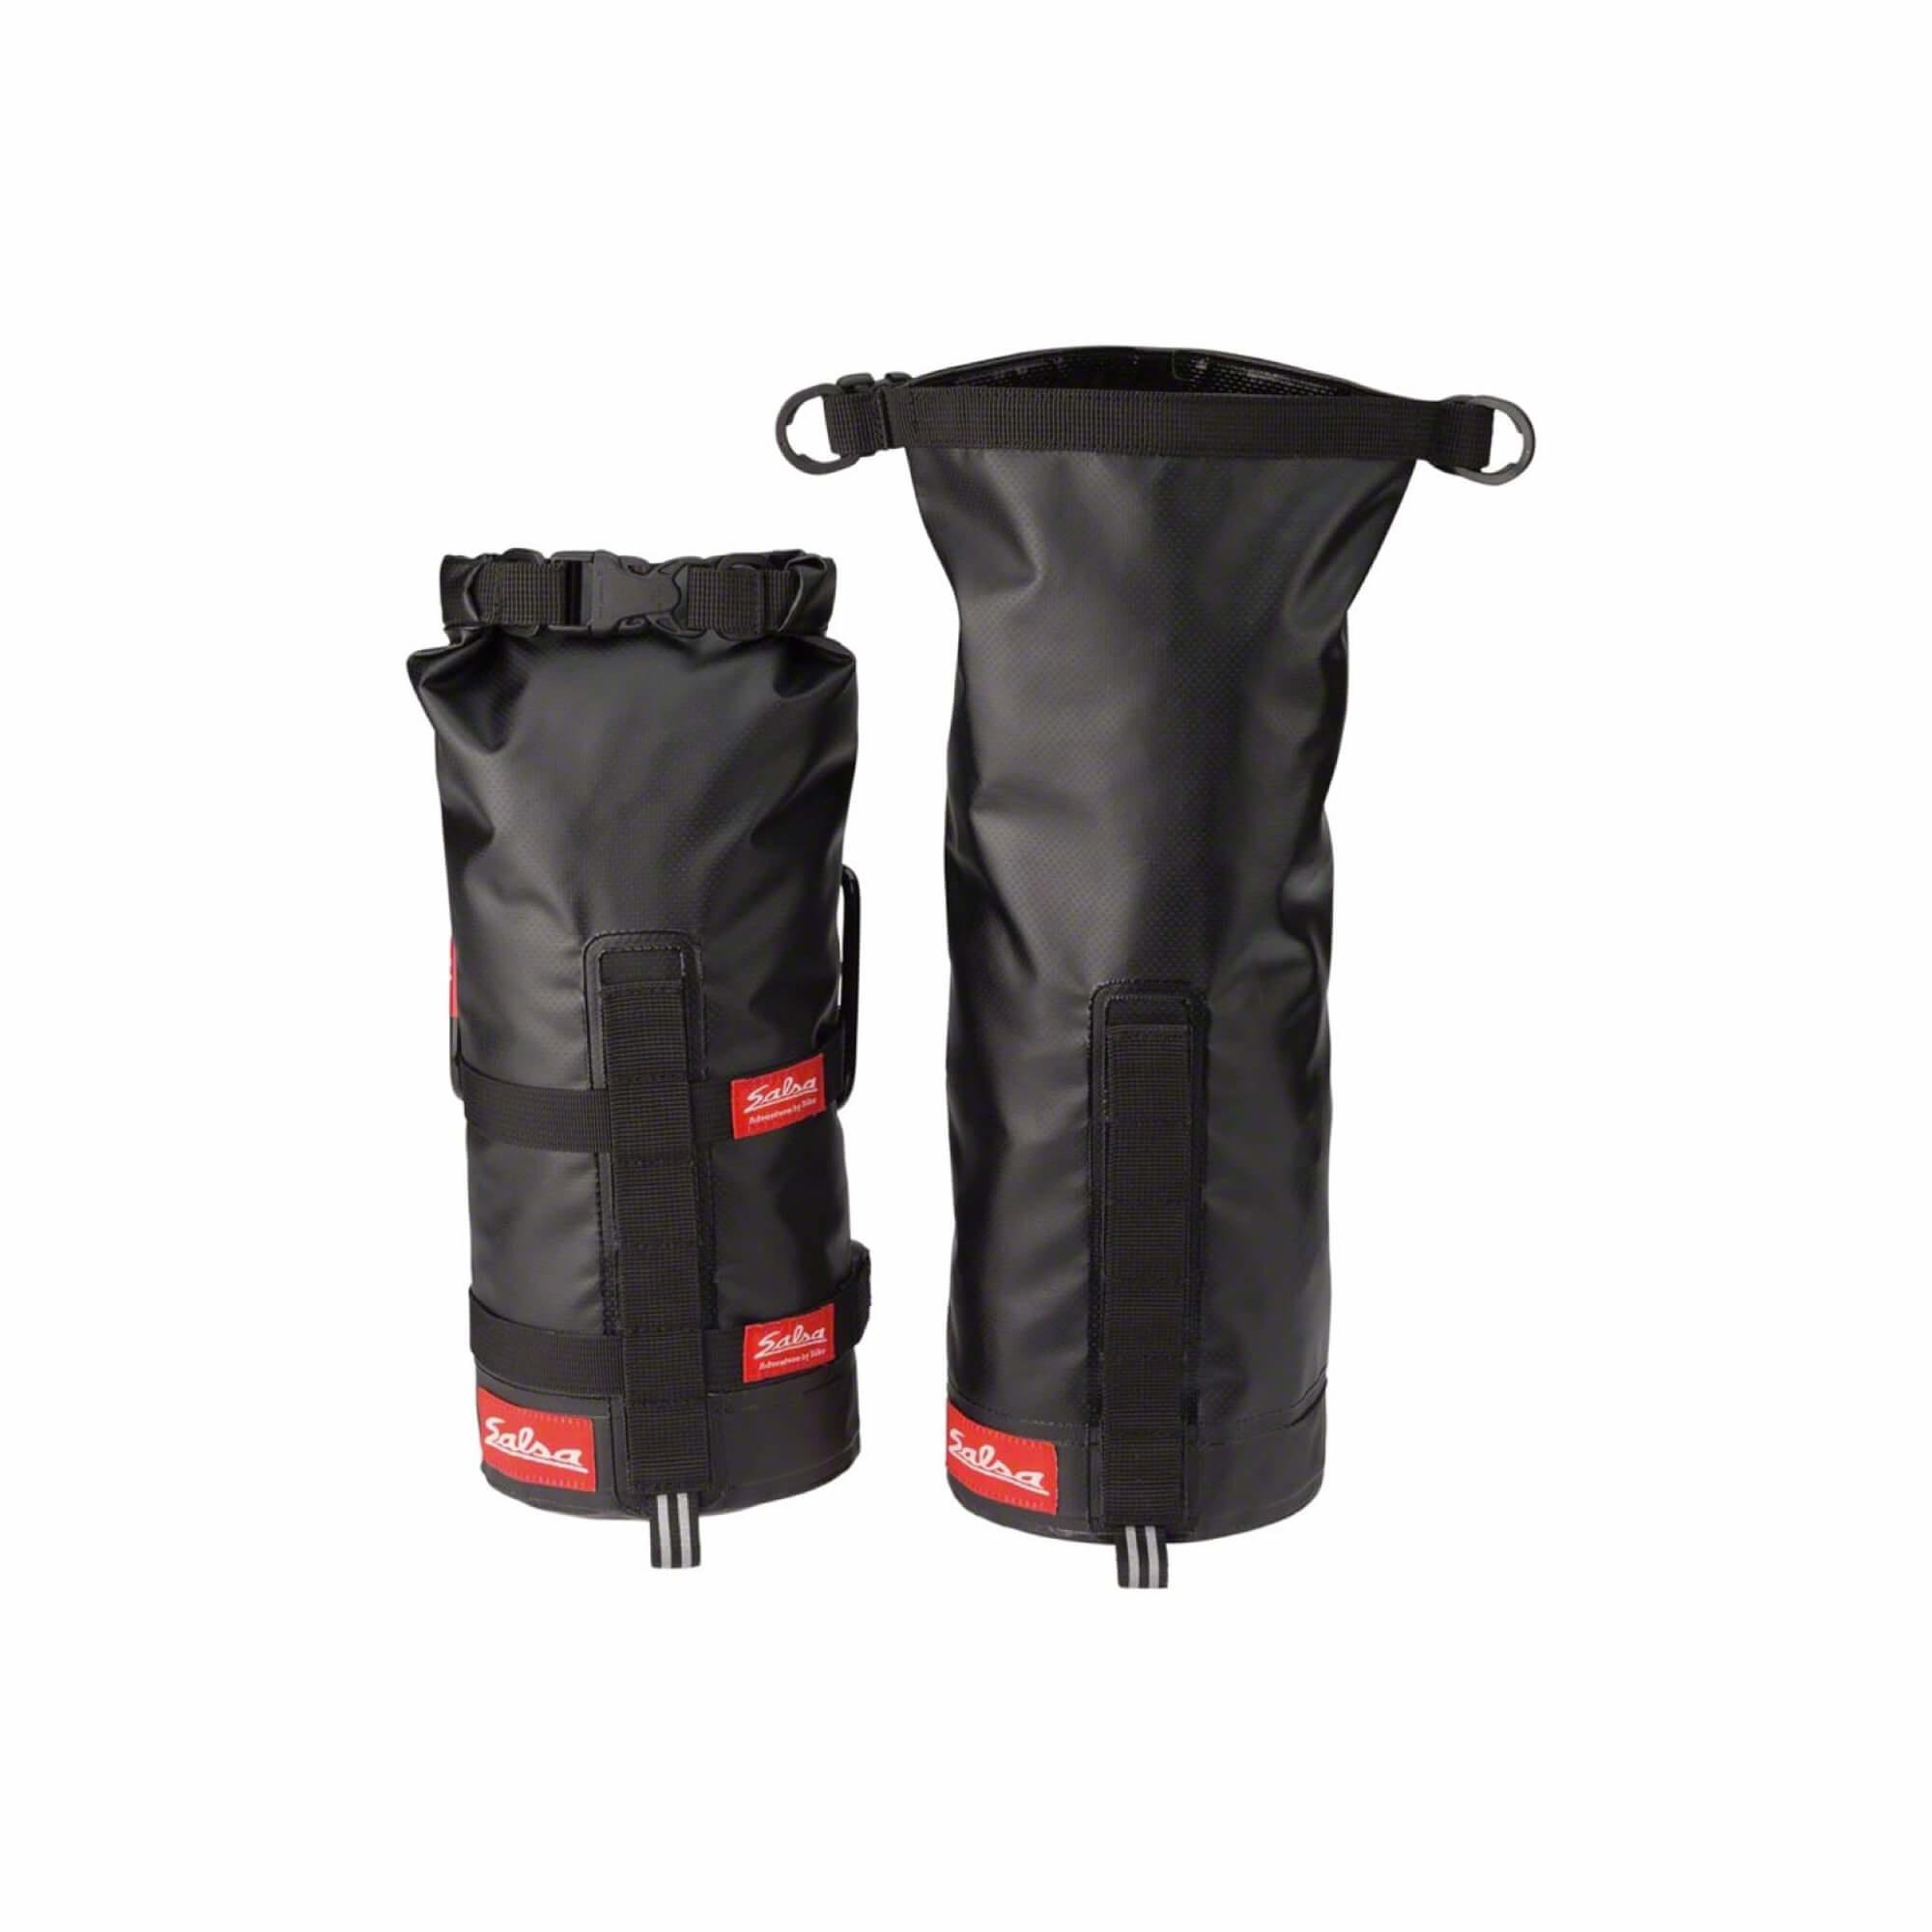 Anything Cage Bag Black Colour: Black-4